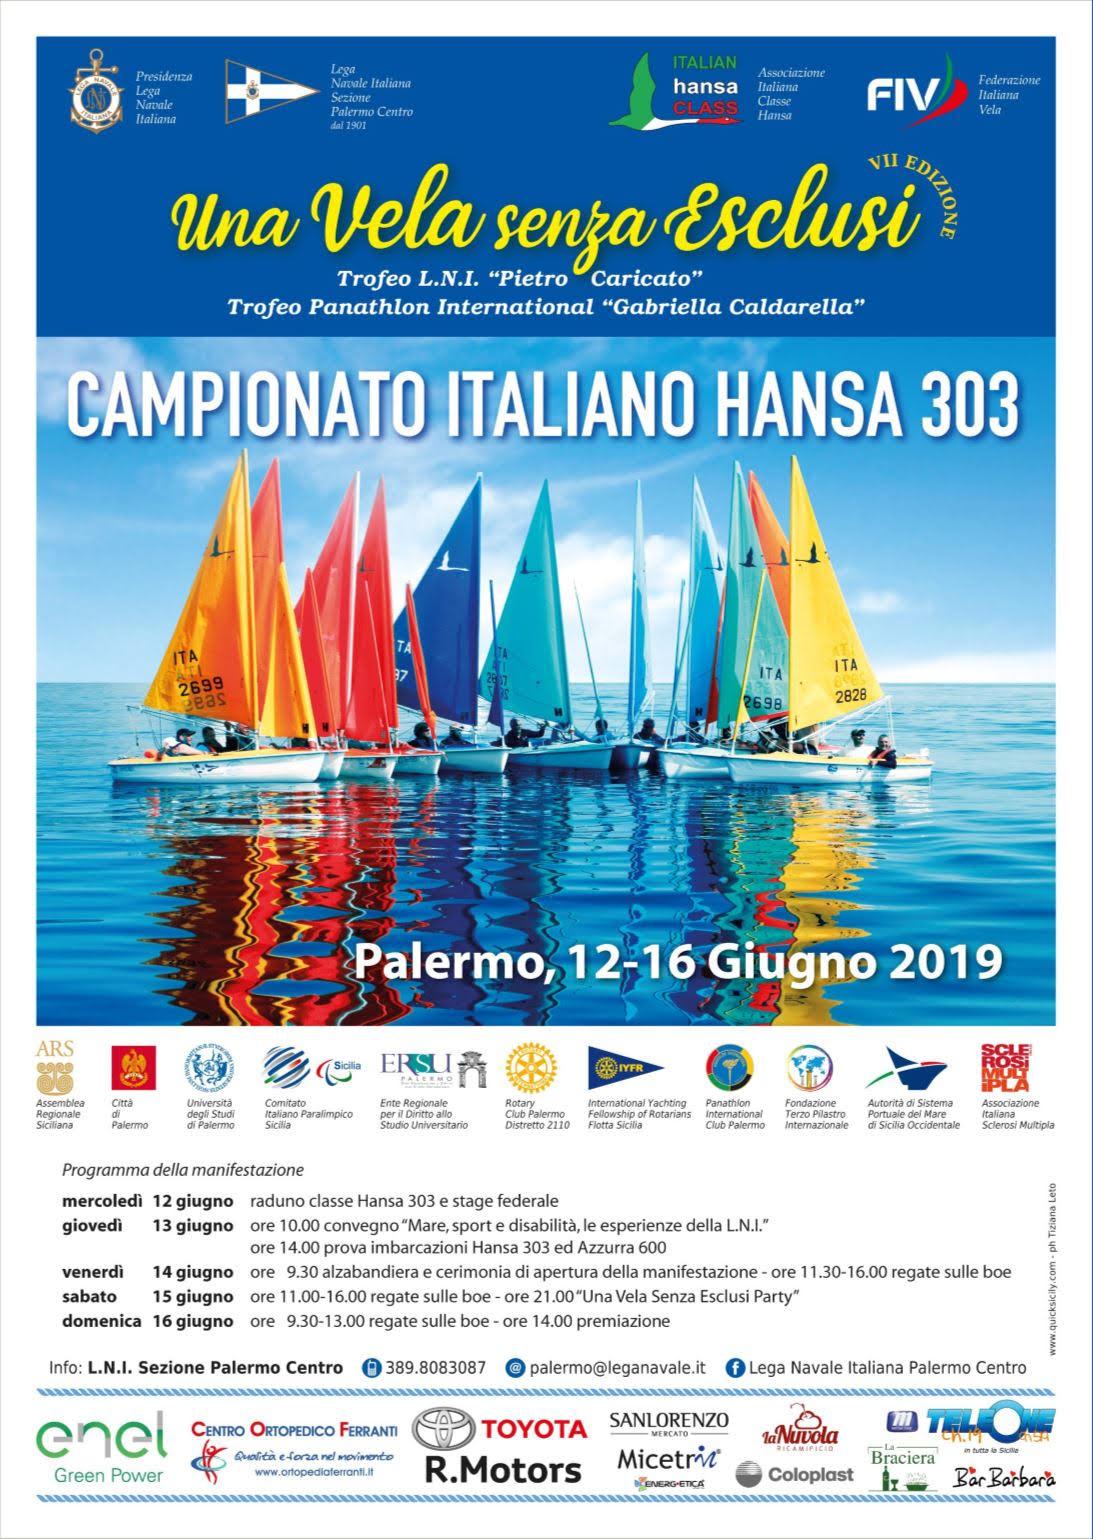 Campionato Italiano Hansa 303